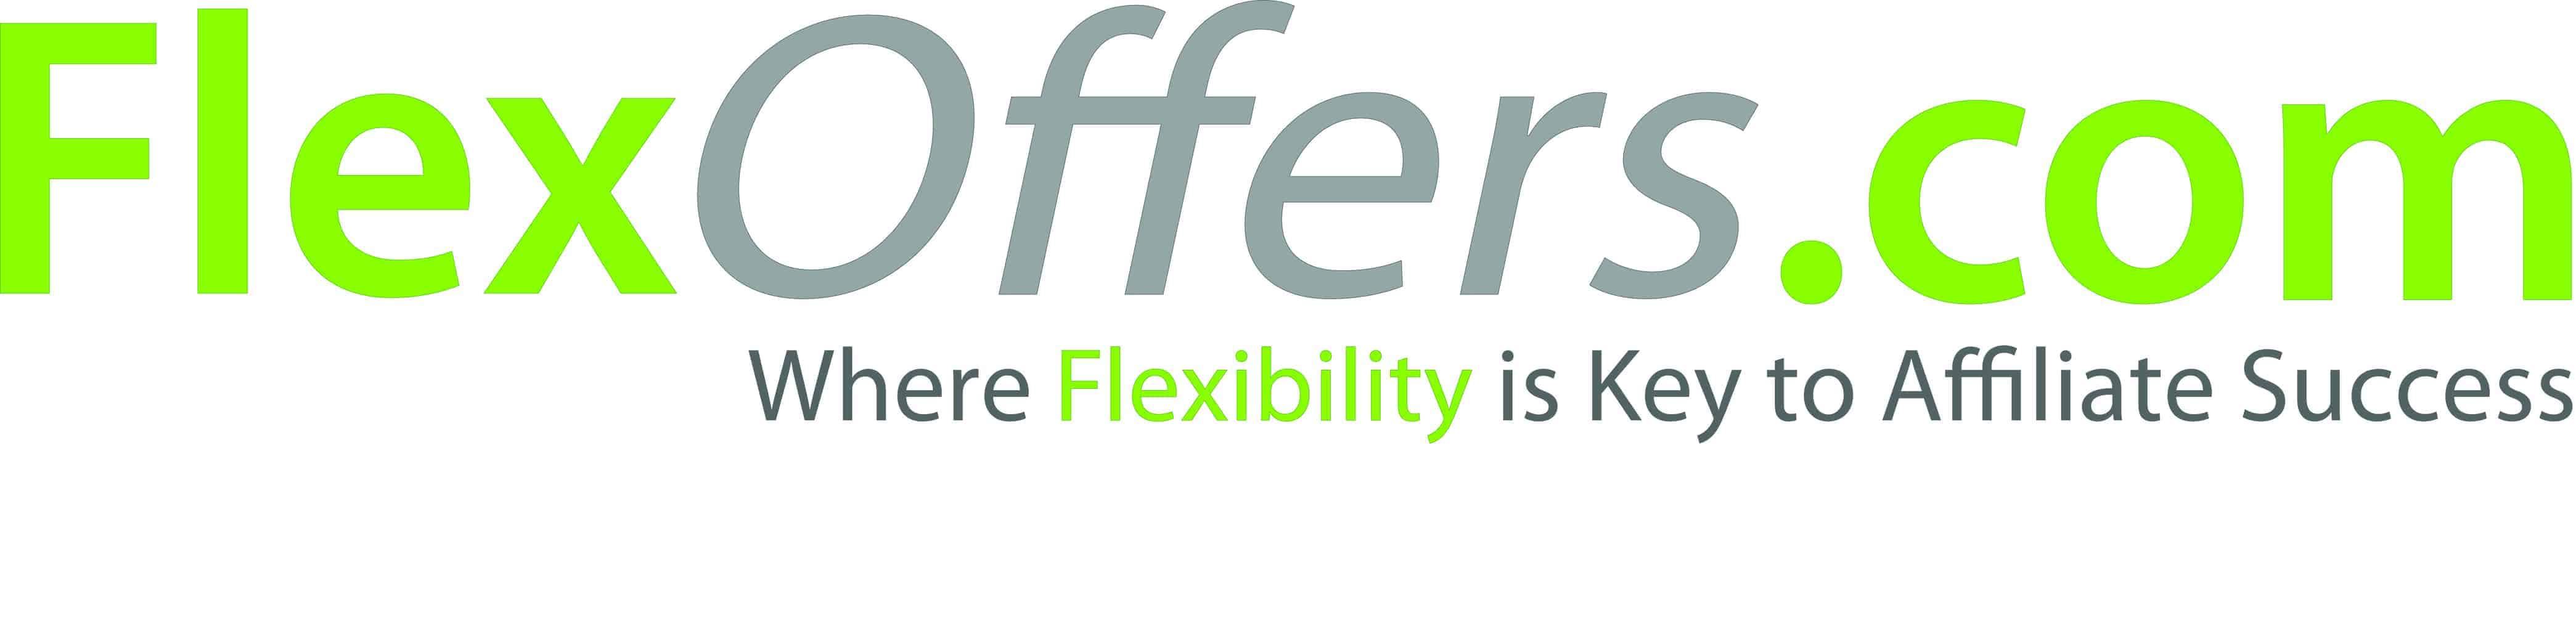 flexoffers-logo